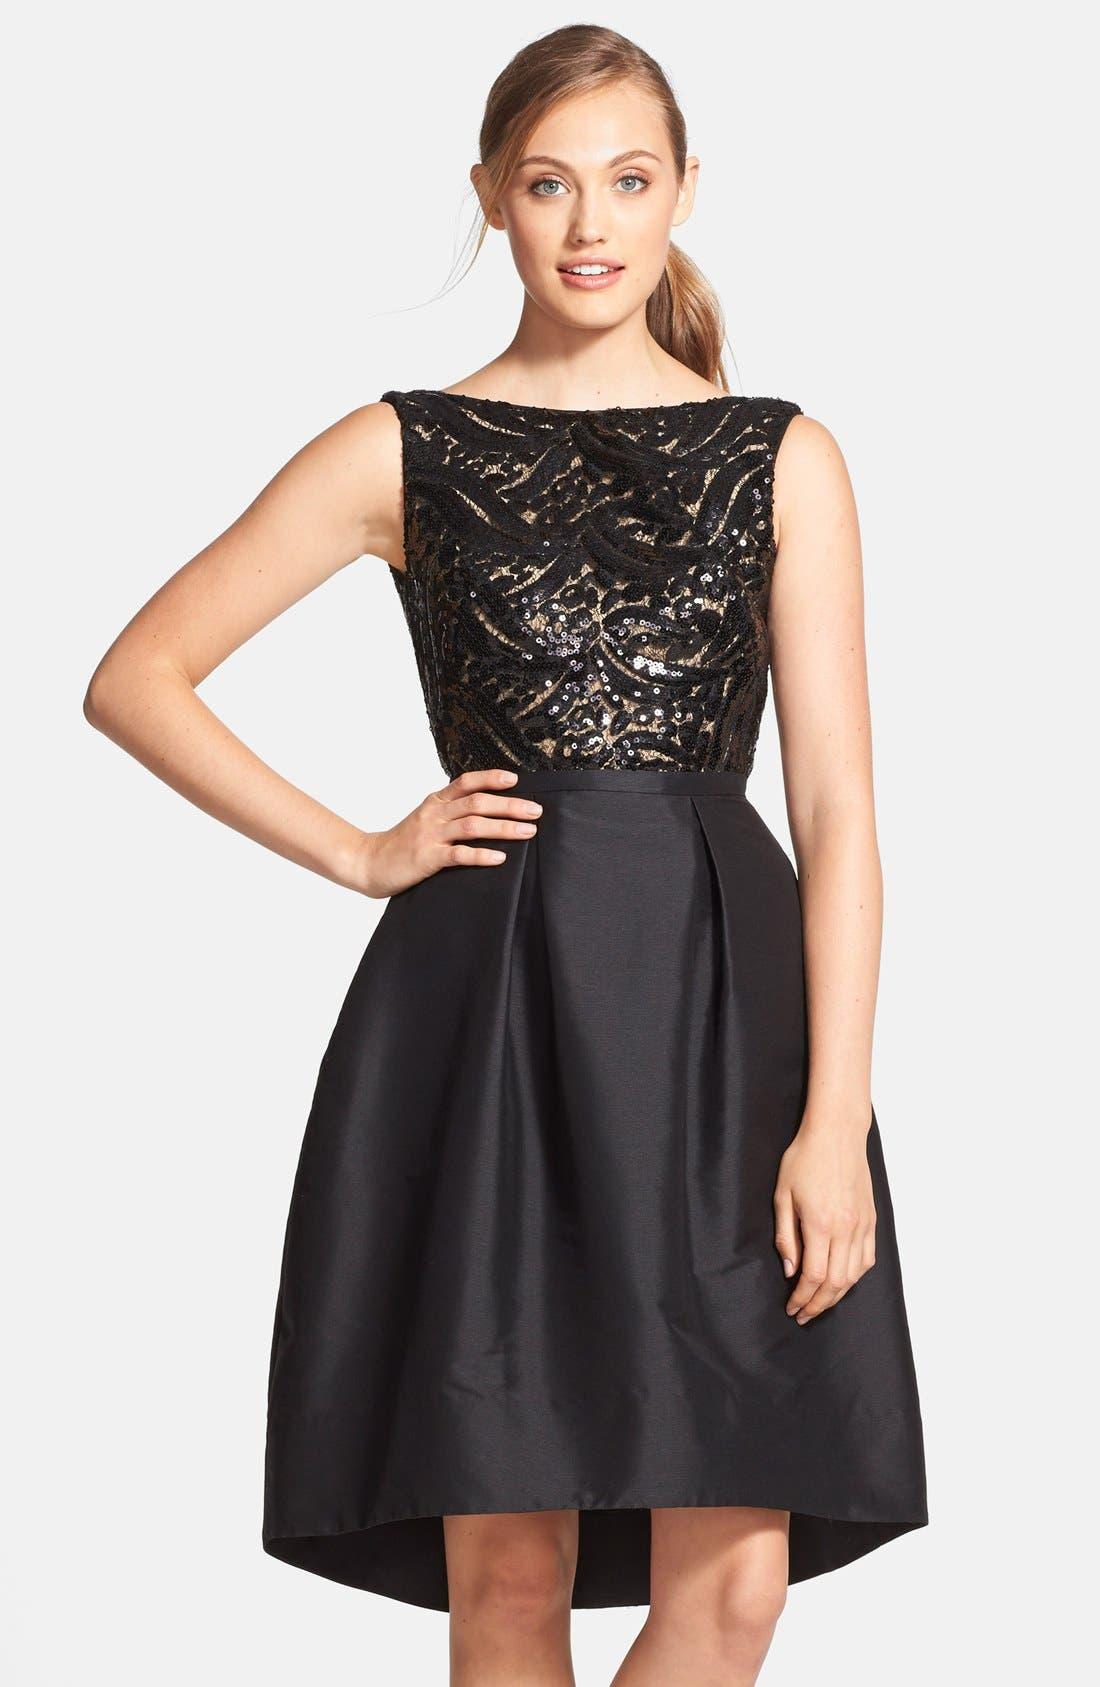 Alternate Image 1 Selected - ML Monique Lhuillier Sequin Bodice Faille Fit & Flare Dress